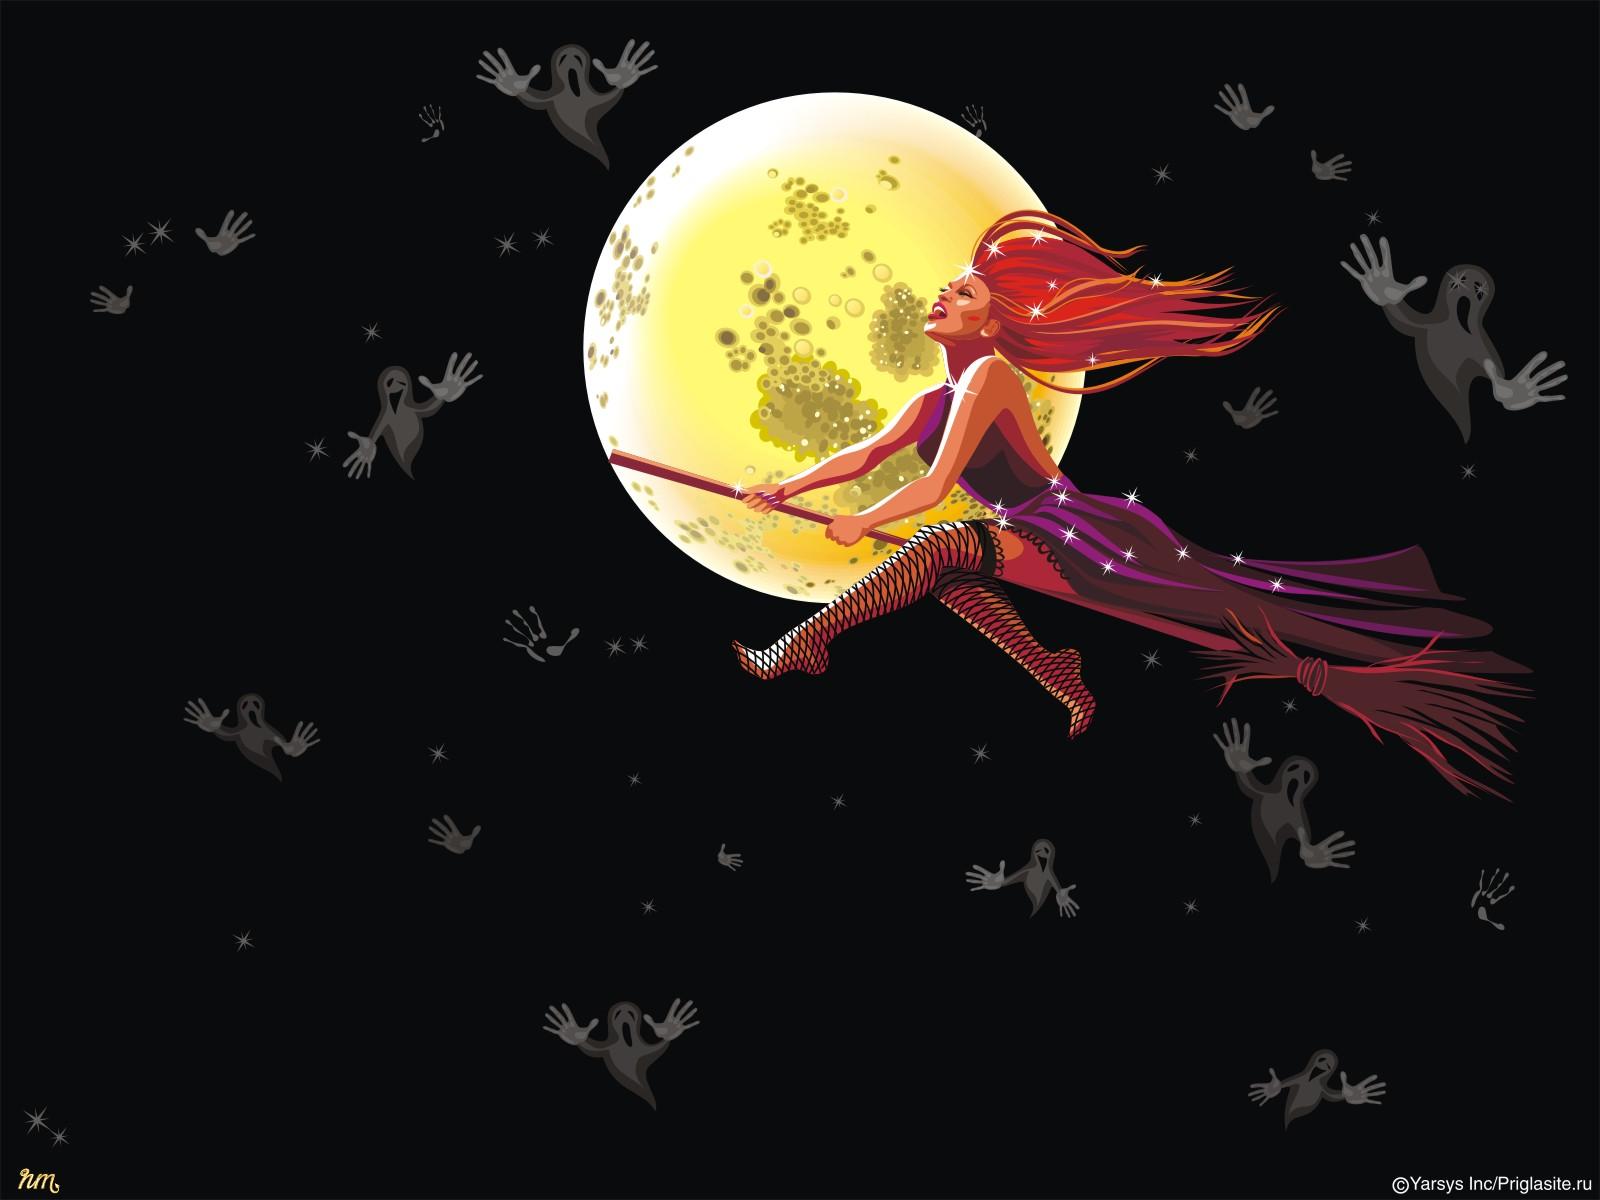 Happy Halloween 2012 Witch HD Wallpaper 1600x1200